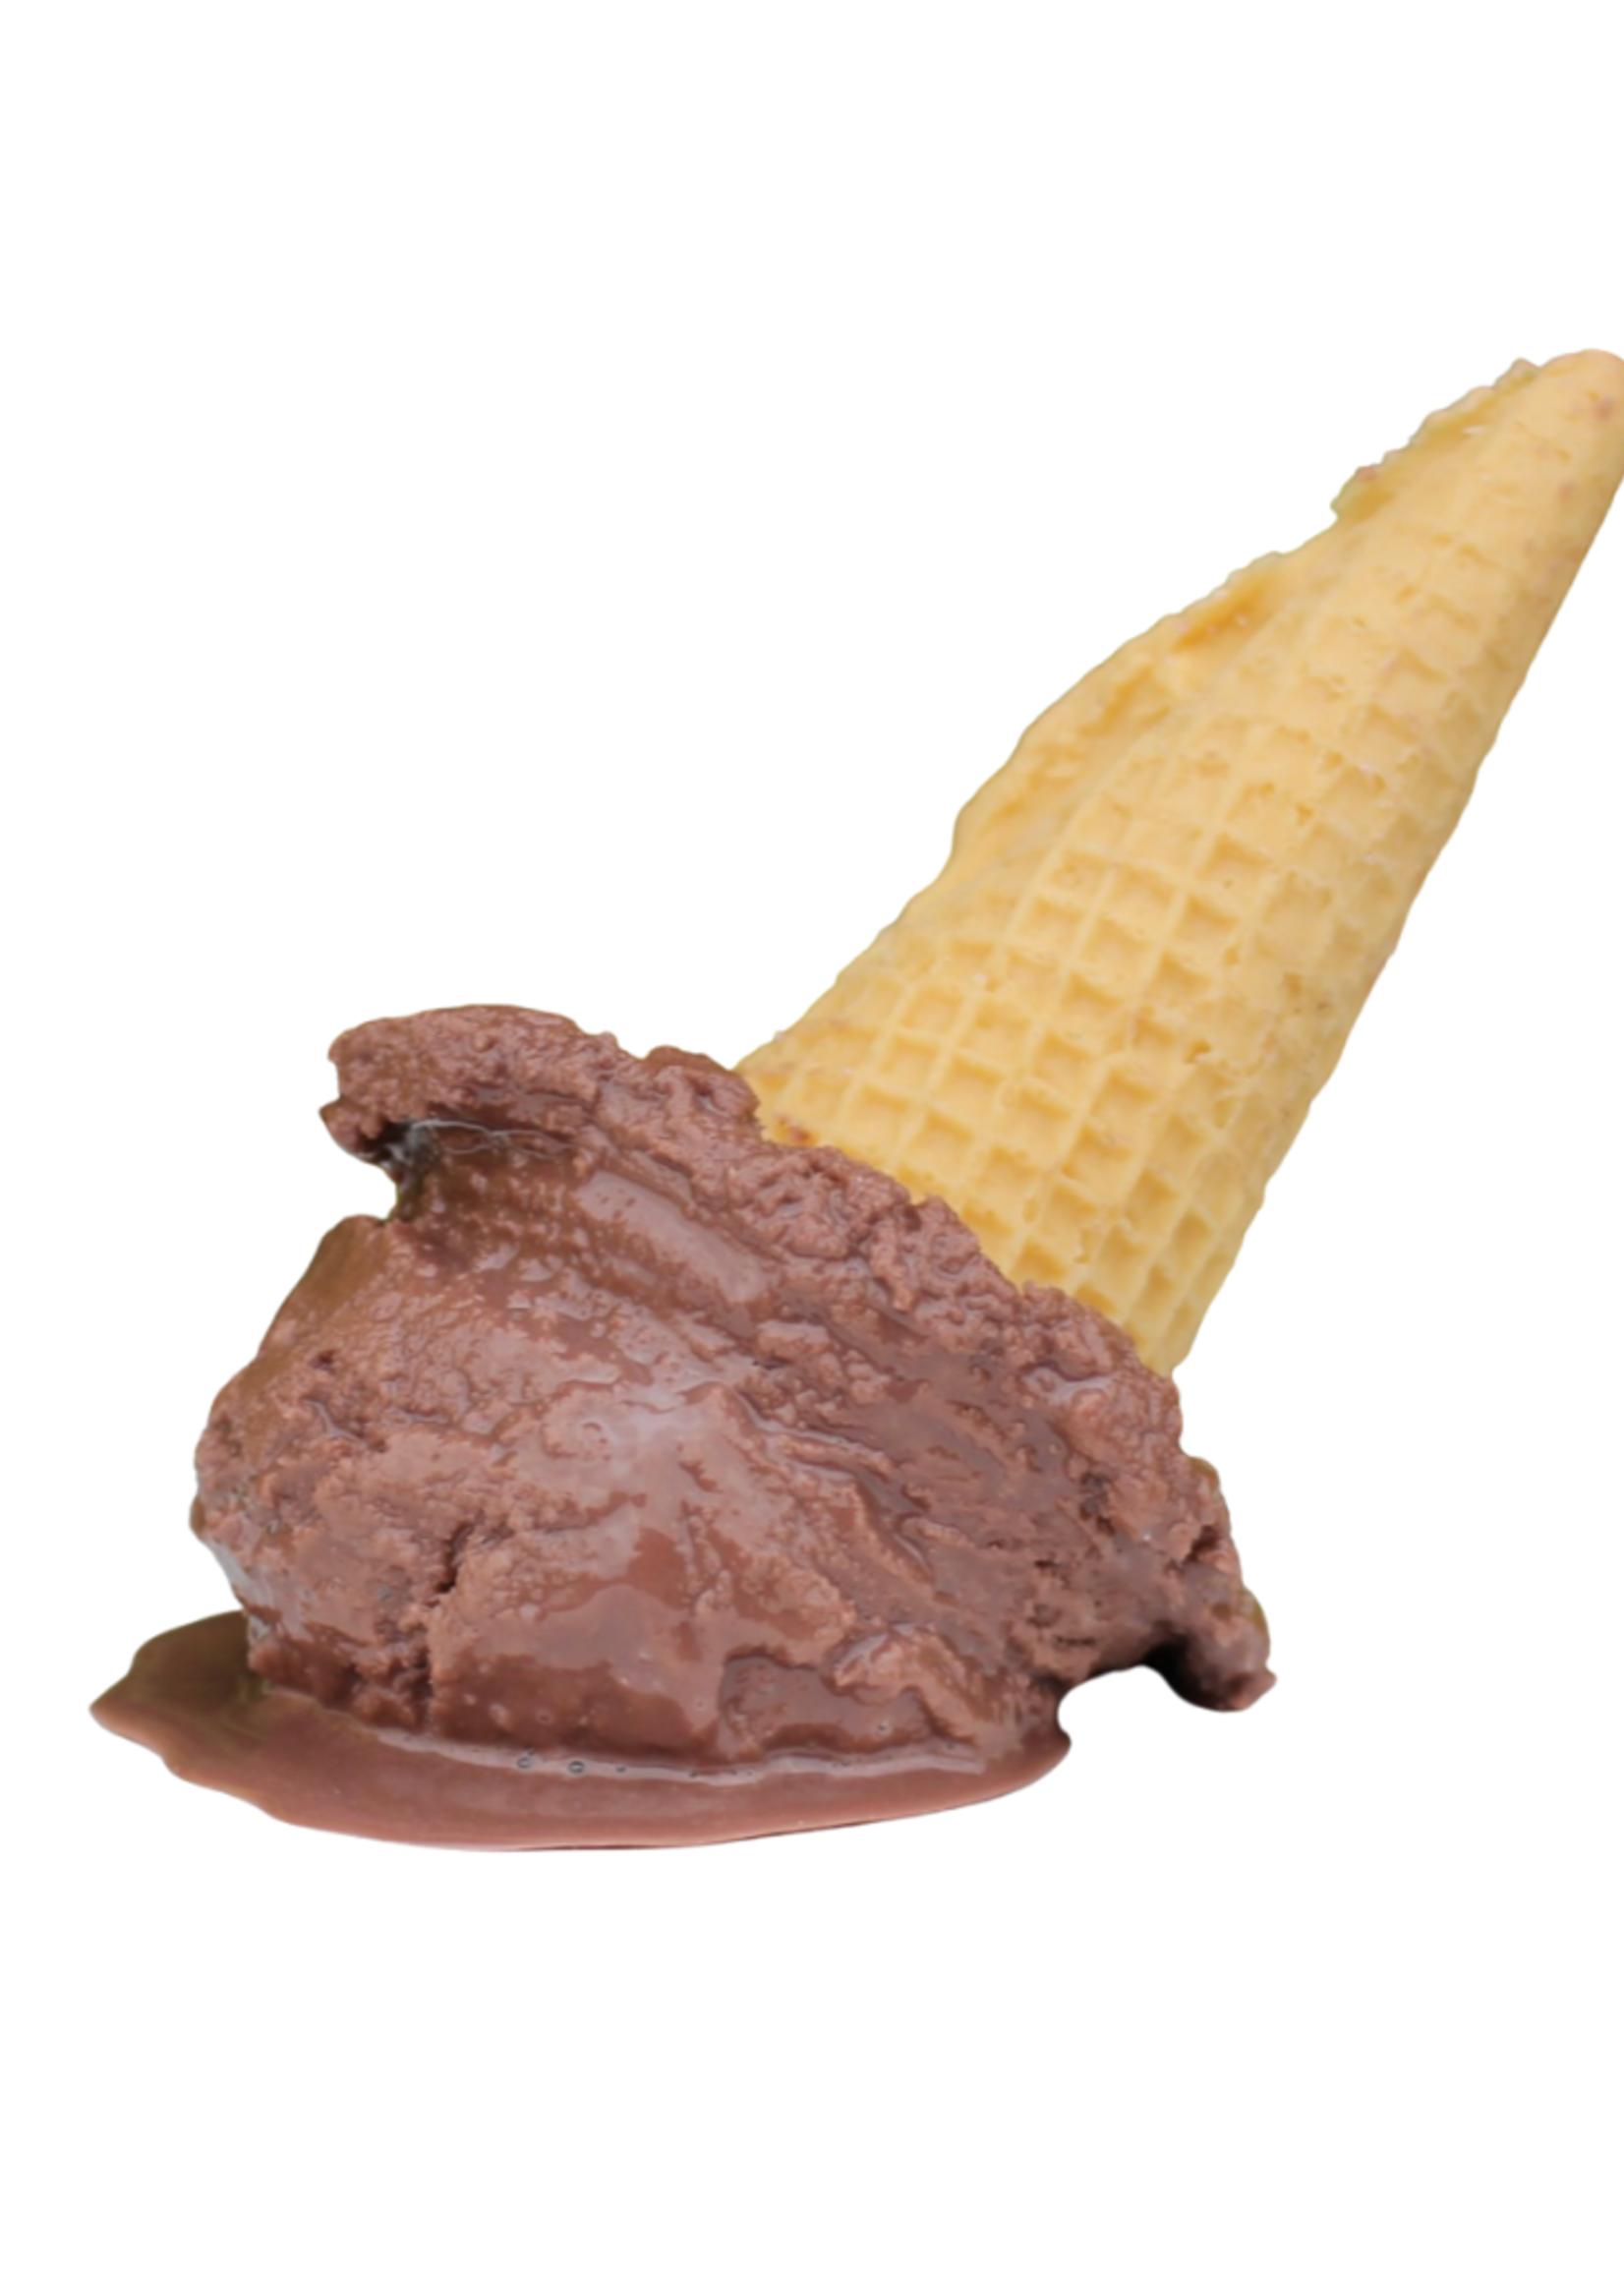 Melting Ice Cream Cone // Chocolate